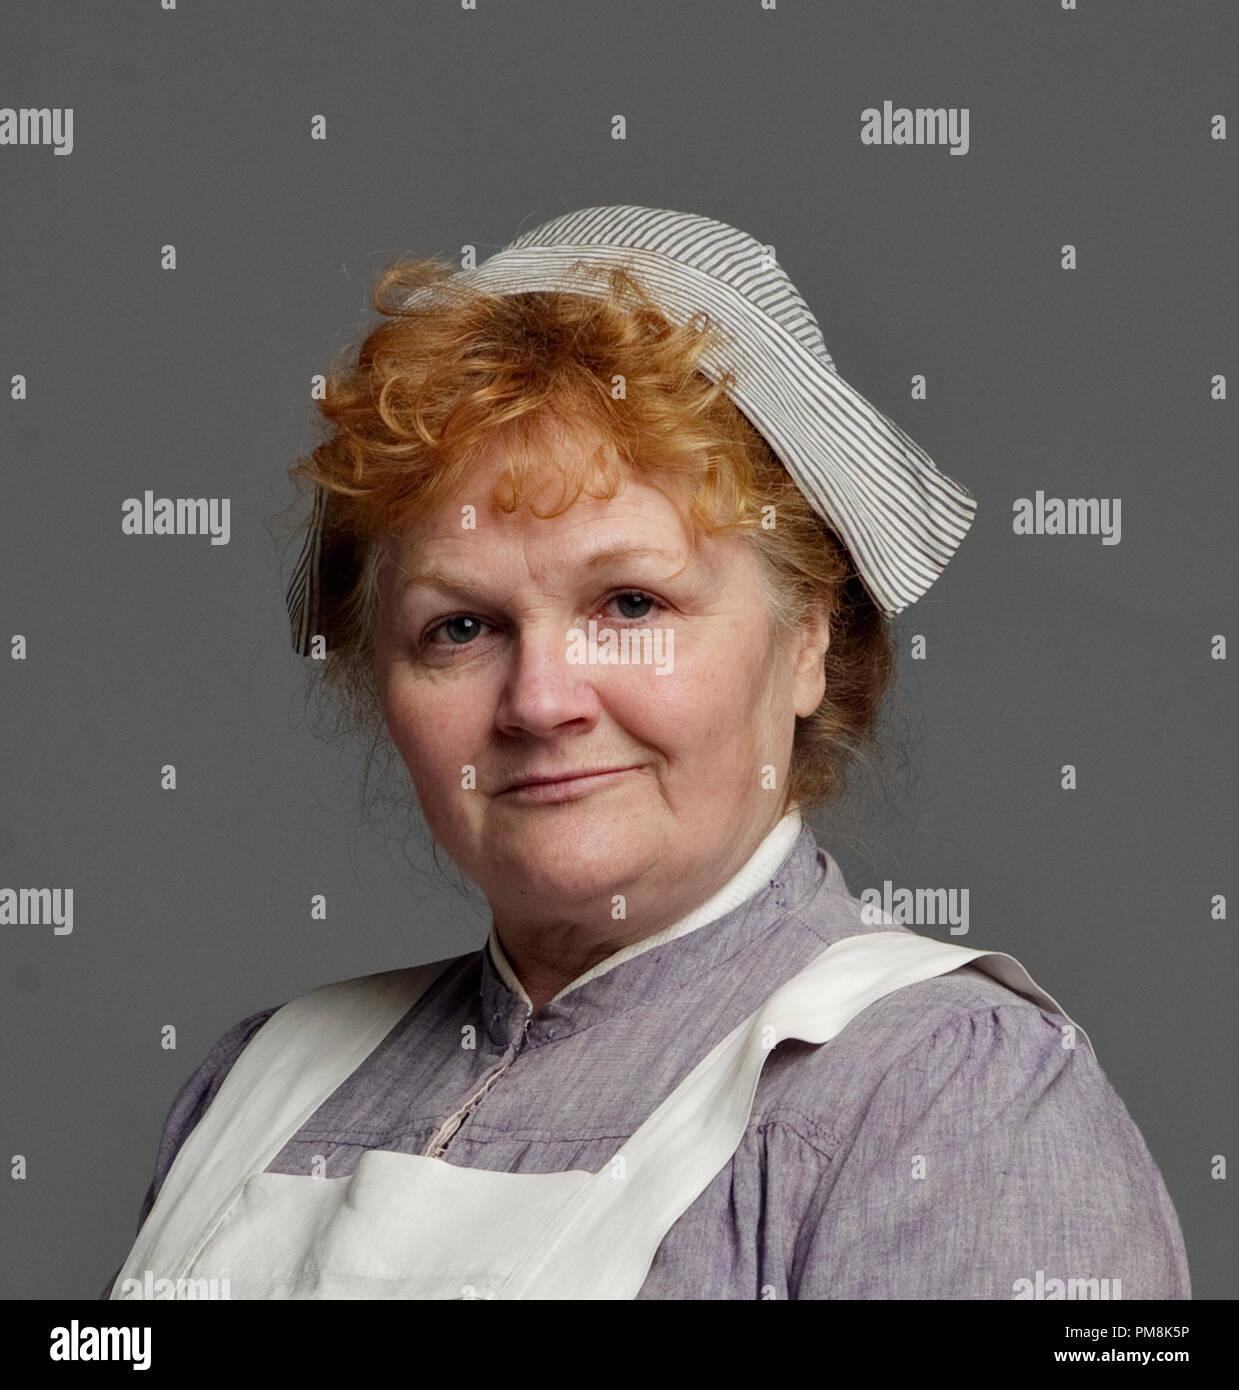 Lesley Nicol as Mrs. Patmore 'Downton Abbey' Season 2, 2012 - Stock Image